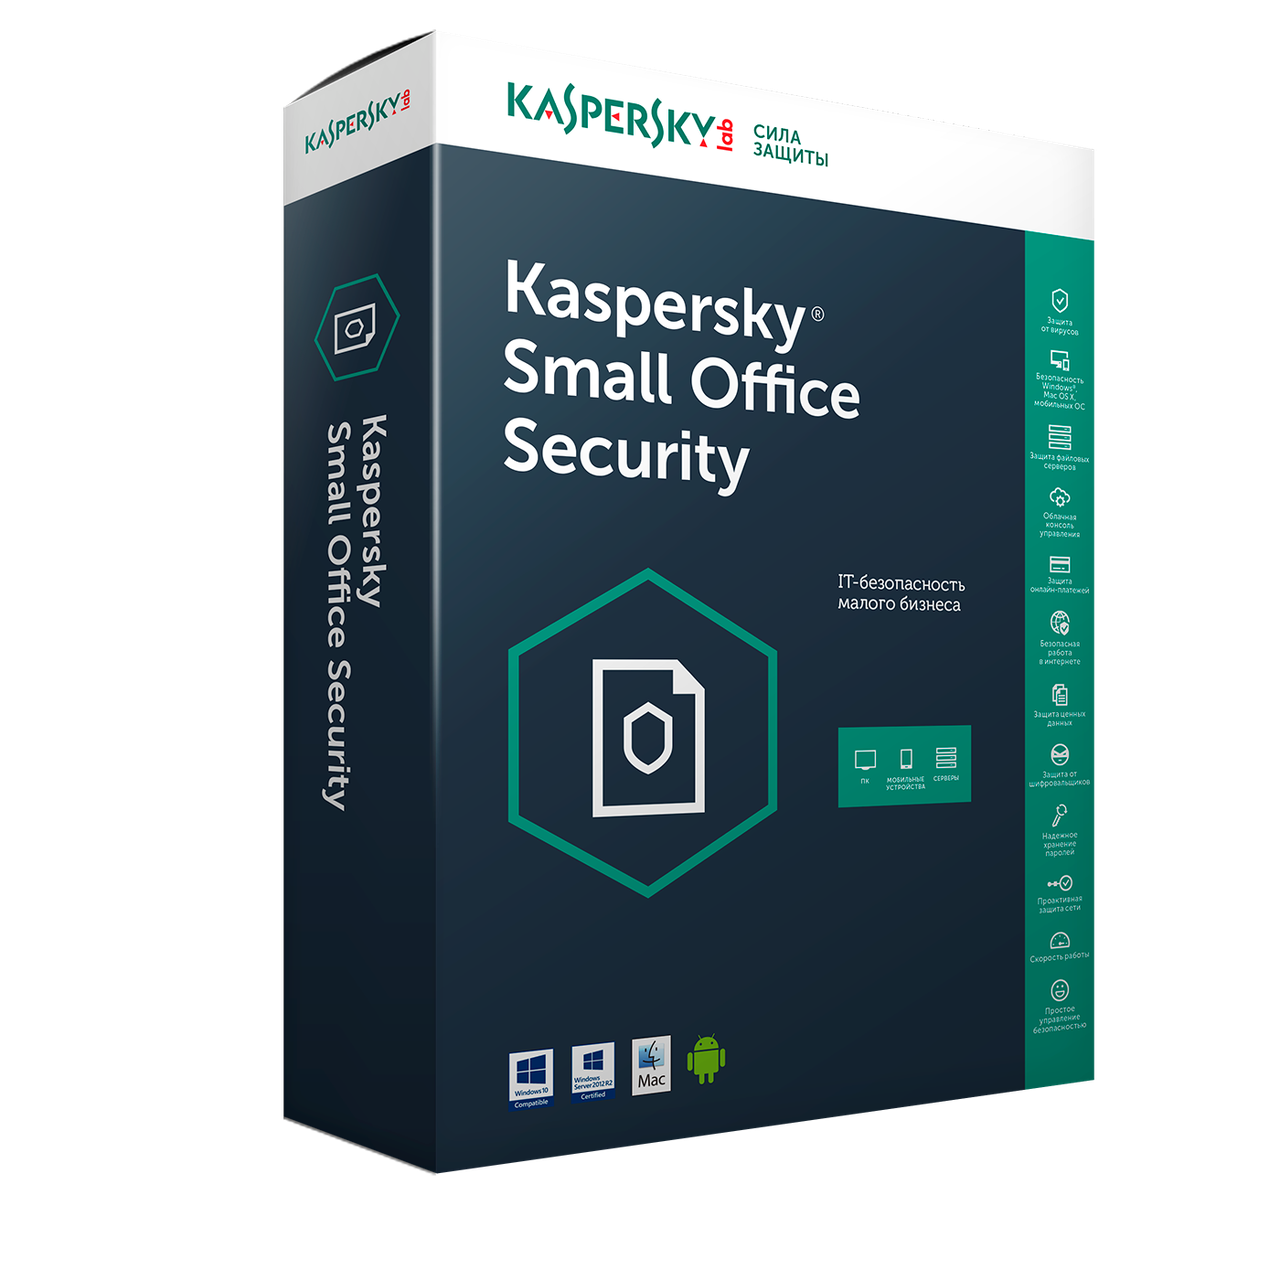 Kaspersky Small Office Security защита от 5 ПК + 5 МУ + 1 сервер — до 24 ПК + 24 МУ + 2 сервера